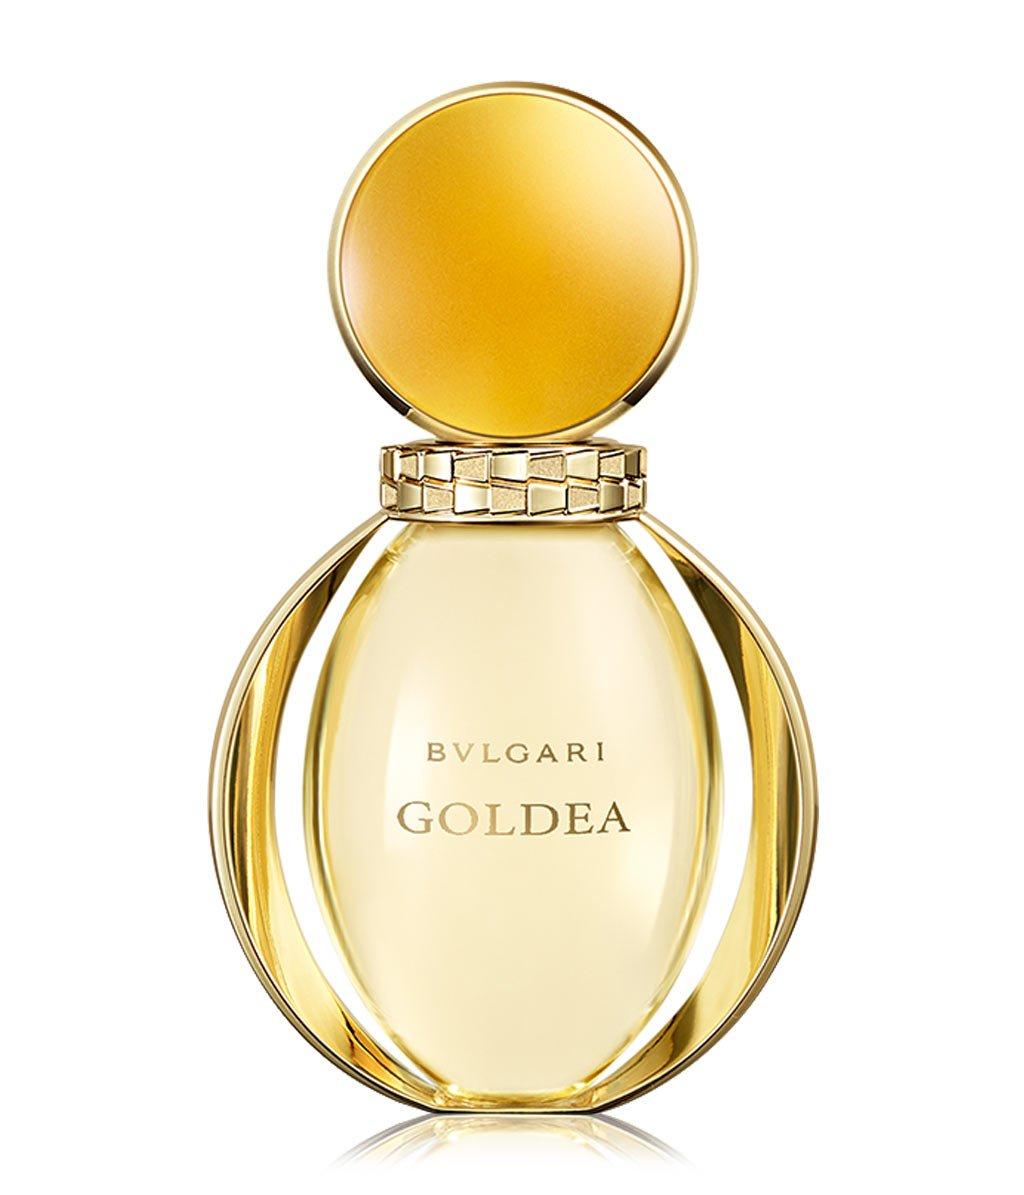 bvlgari goldea parfum bestellen flaconi. Black Bedroom Furniture Sets. Home Design Ideas